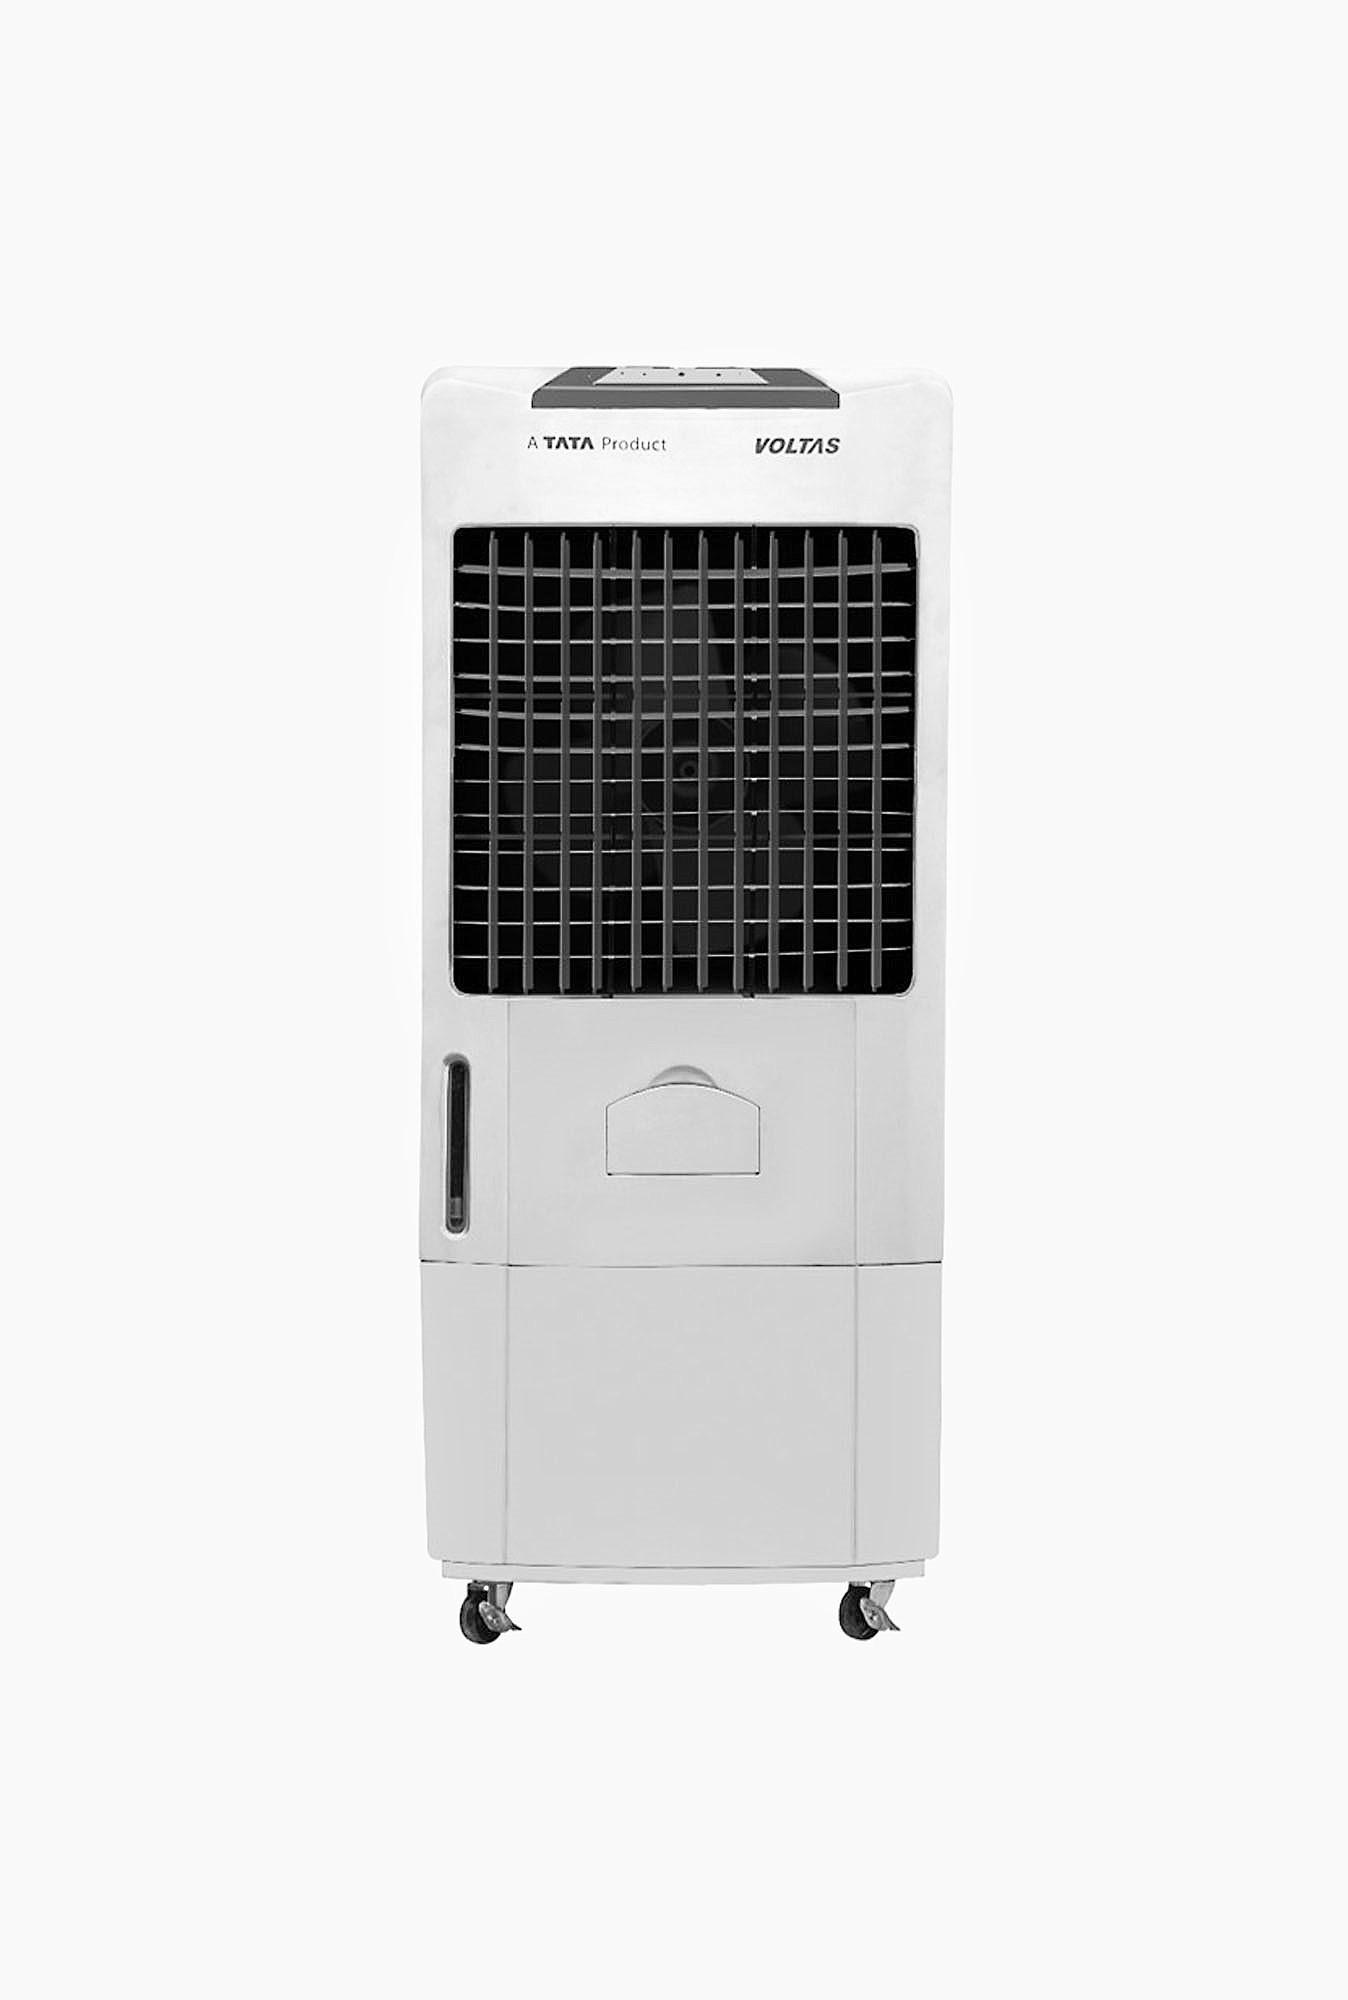 Voltas ELECTRONIC COOLER(VE-D60EH) Desert Air Cooler(White, 60 Litres)   Air Cooler  (Voltas)